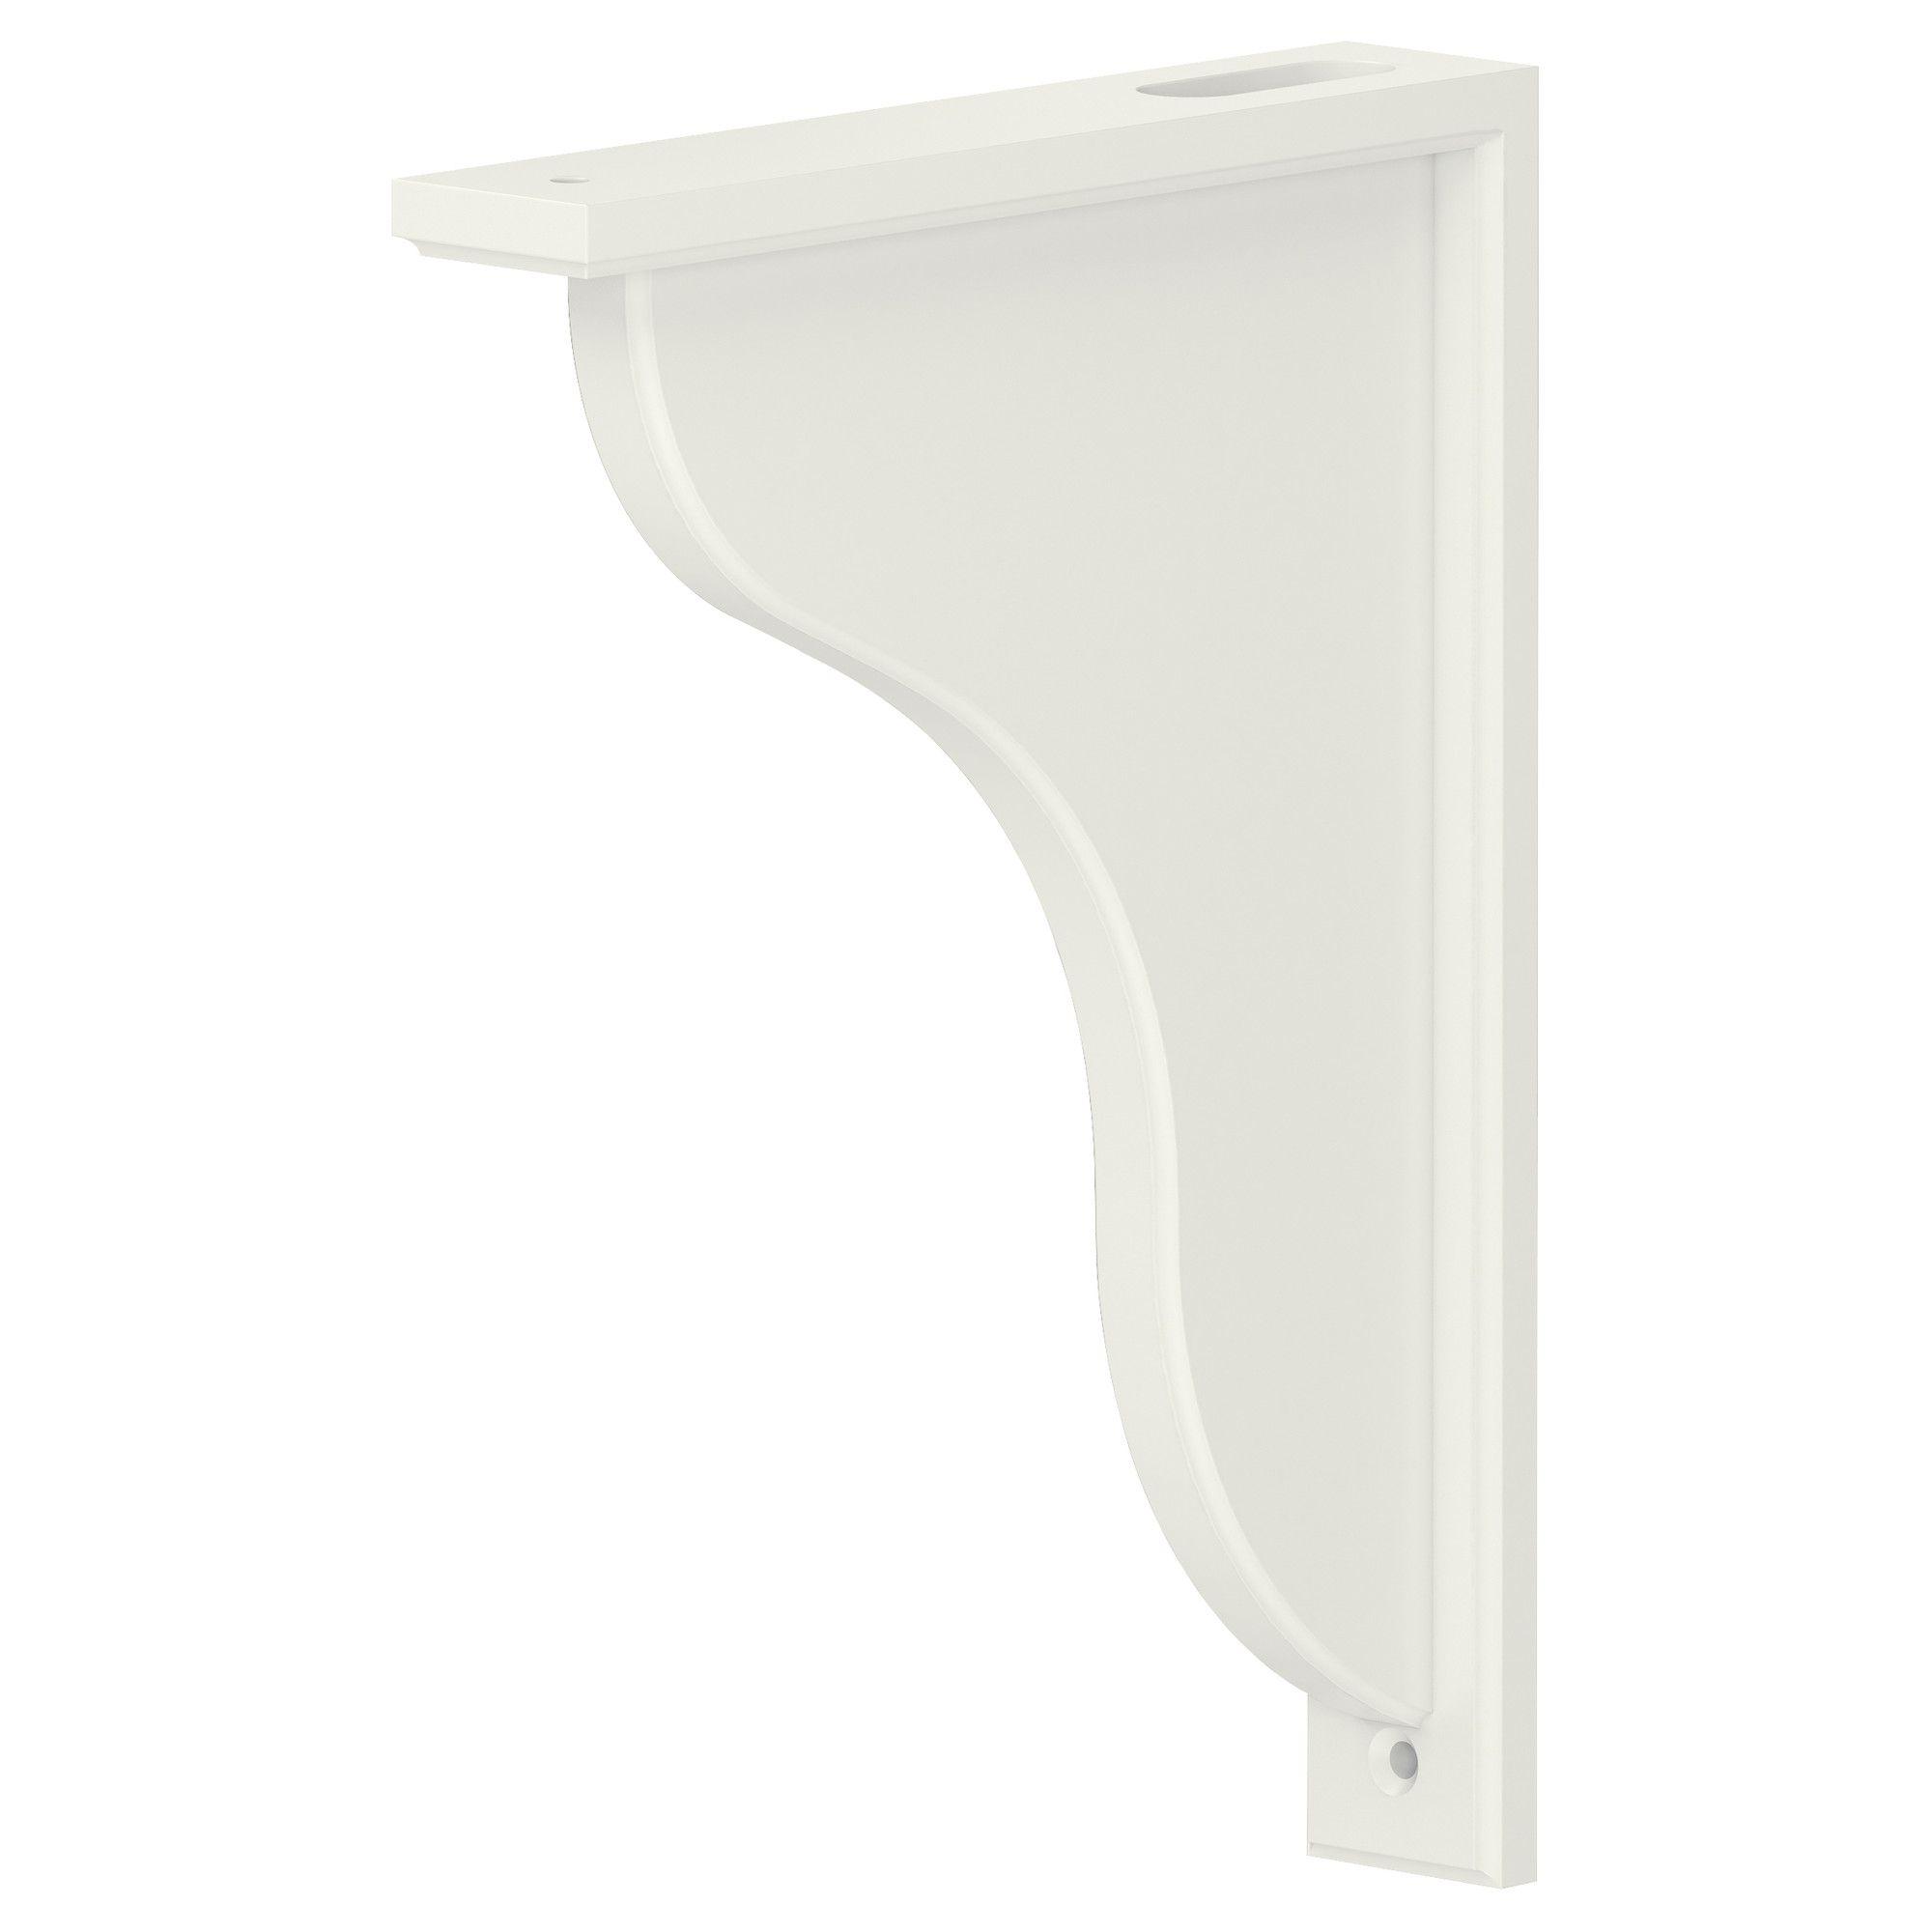 US Furniture and Home Furnishings White wood shelves